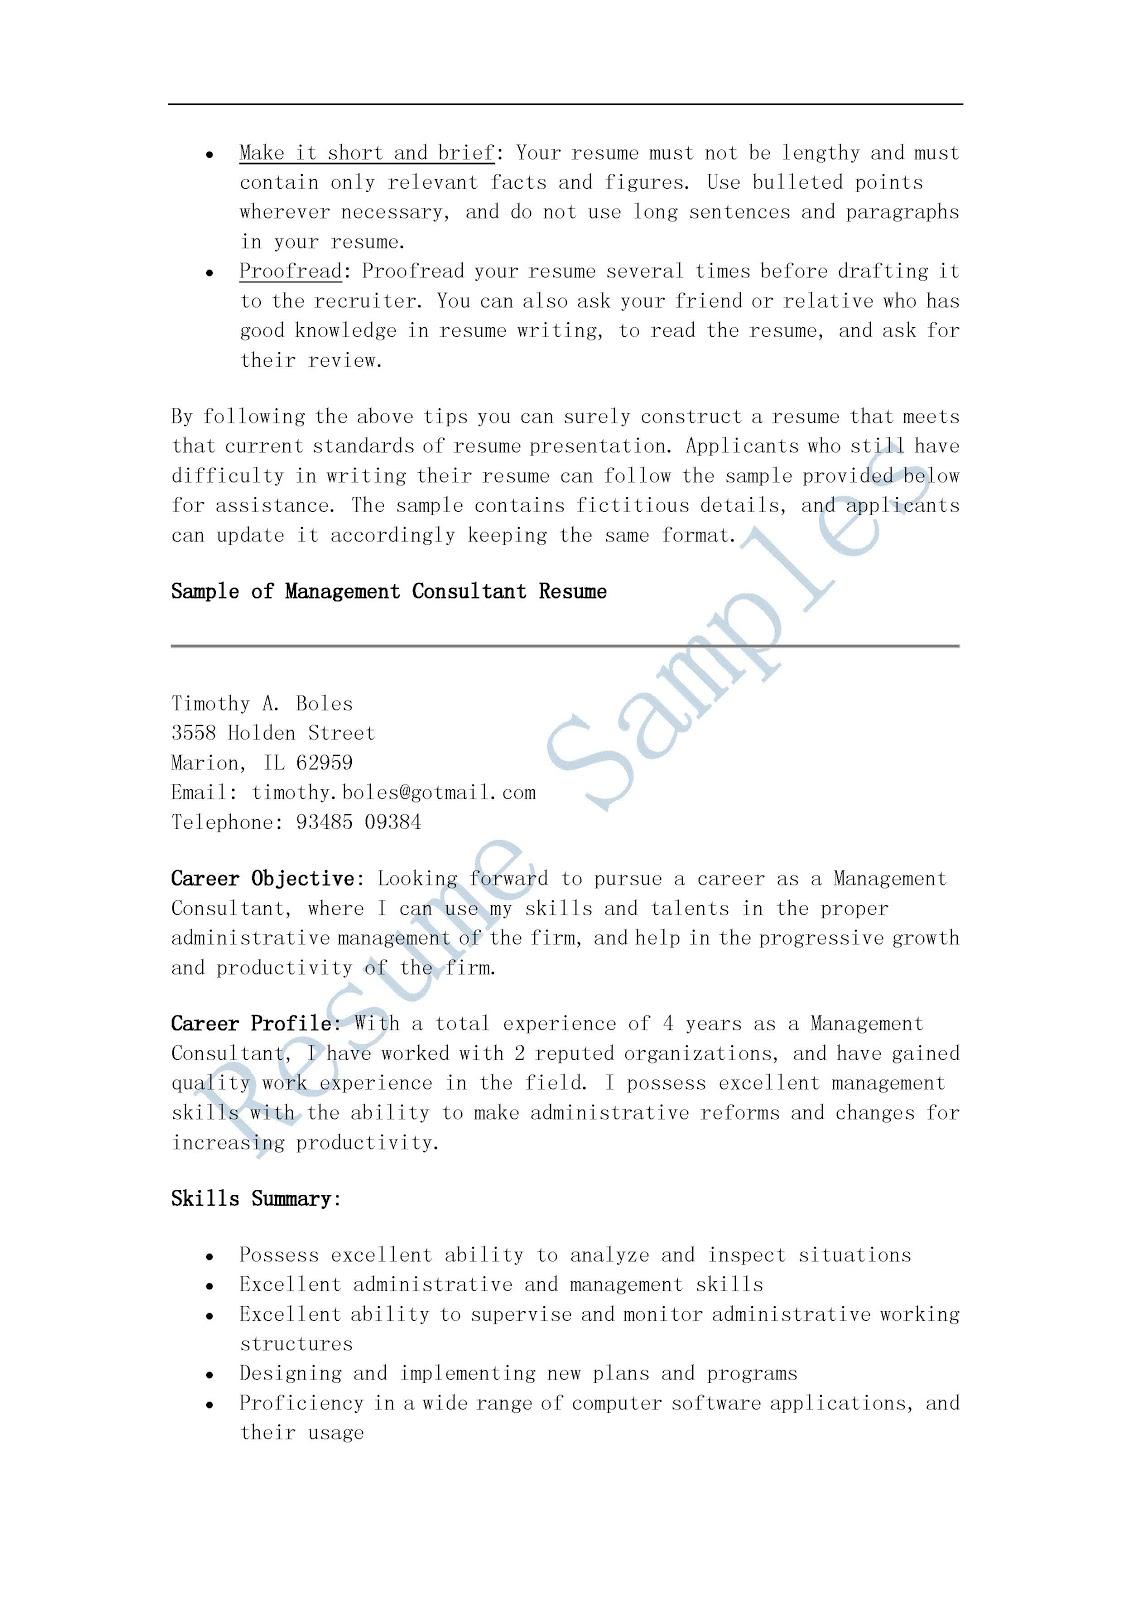 100 sle consulting resume mckinsey free mckinsey